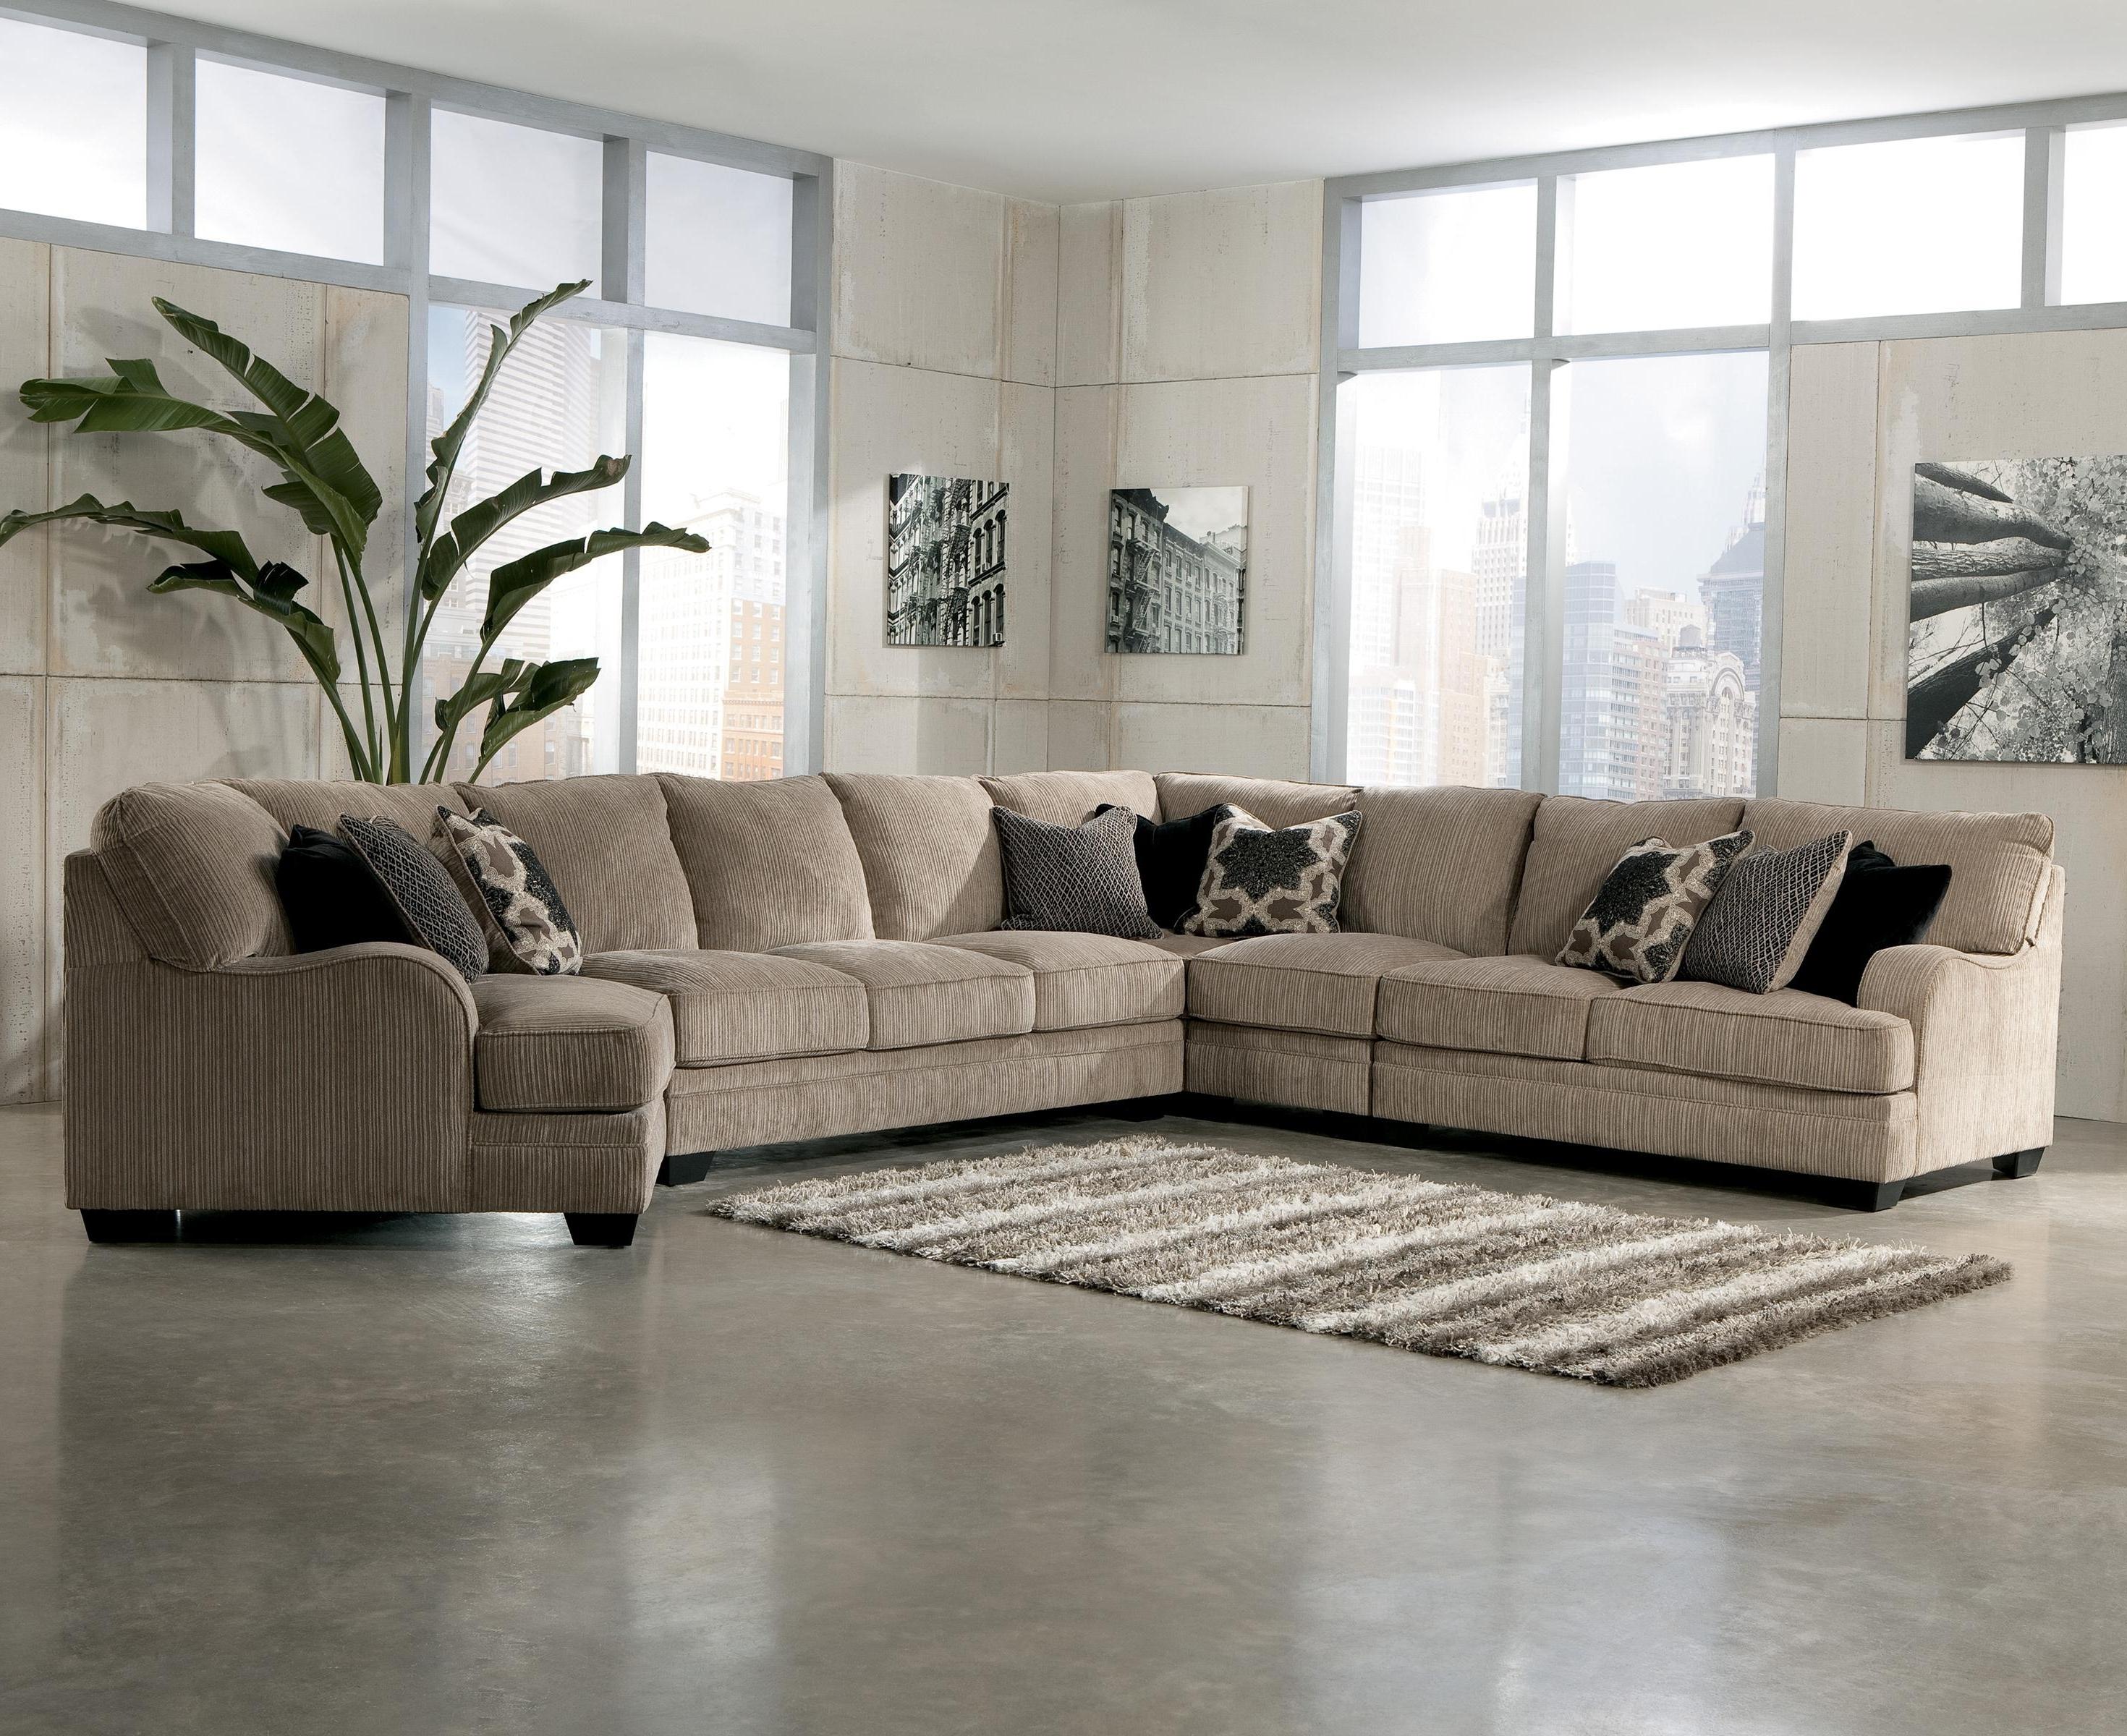 Signature Designashley Katisha – Platinum 5 Piece Sectional Regarding 2019 Killeen Tx Sectional Sofas (View 19 of 20)